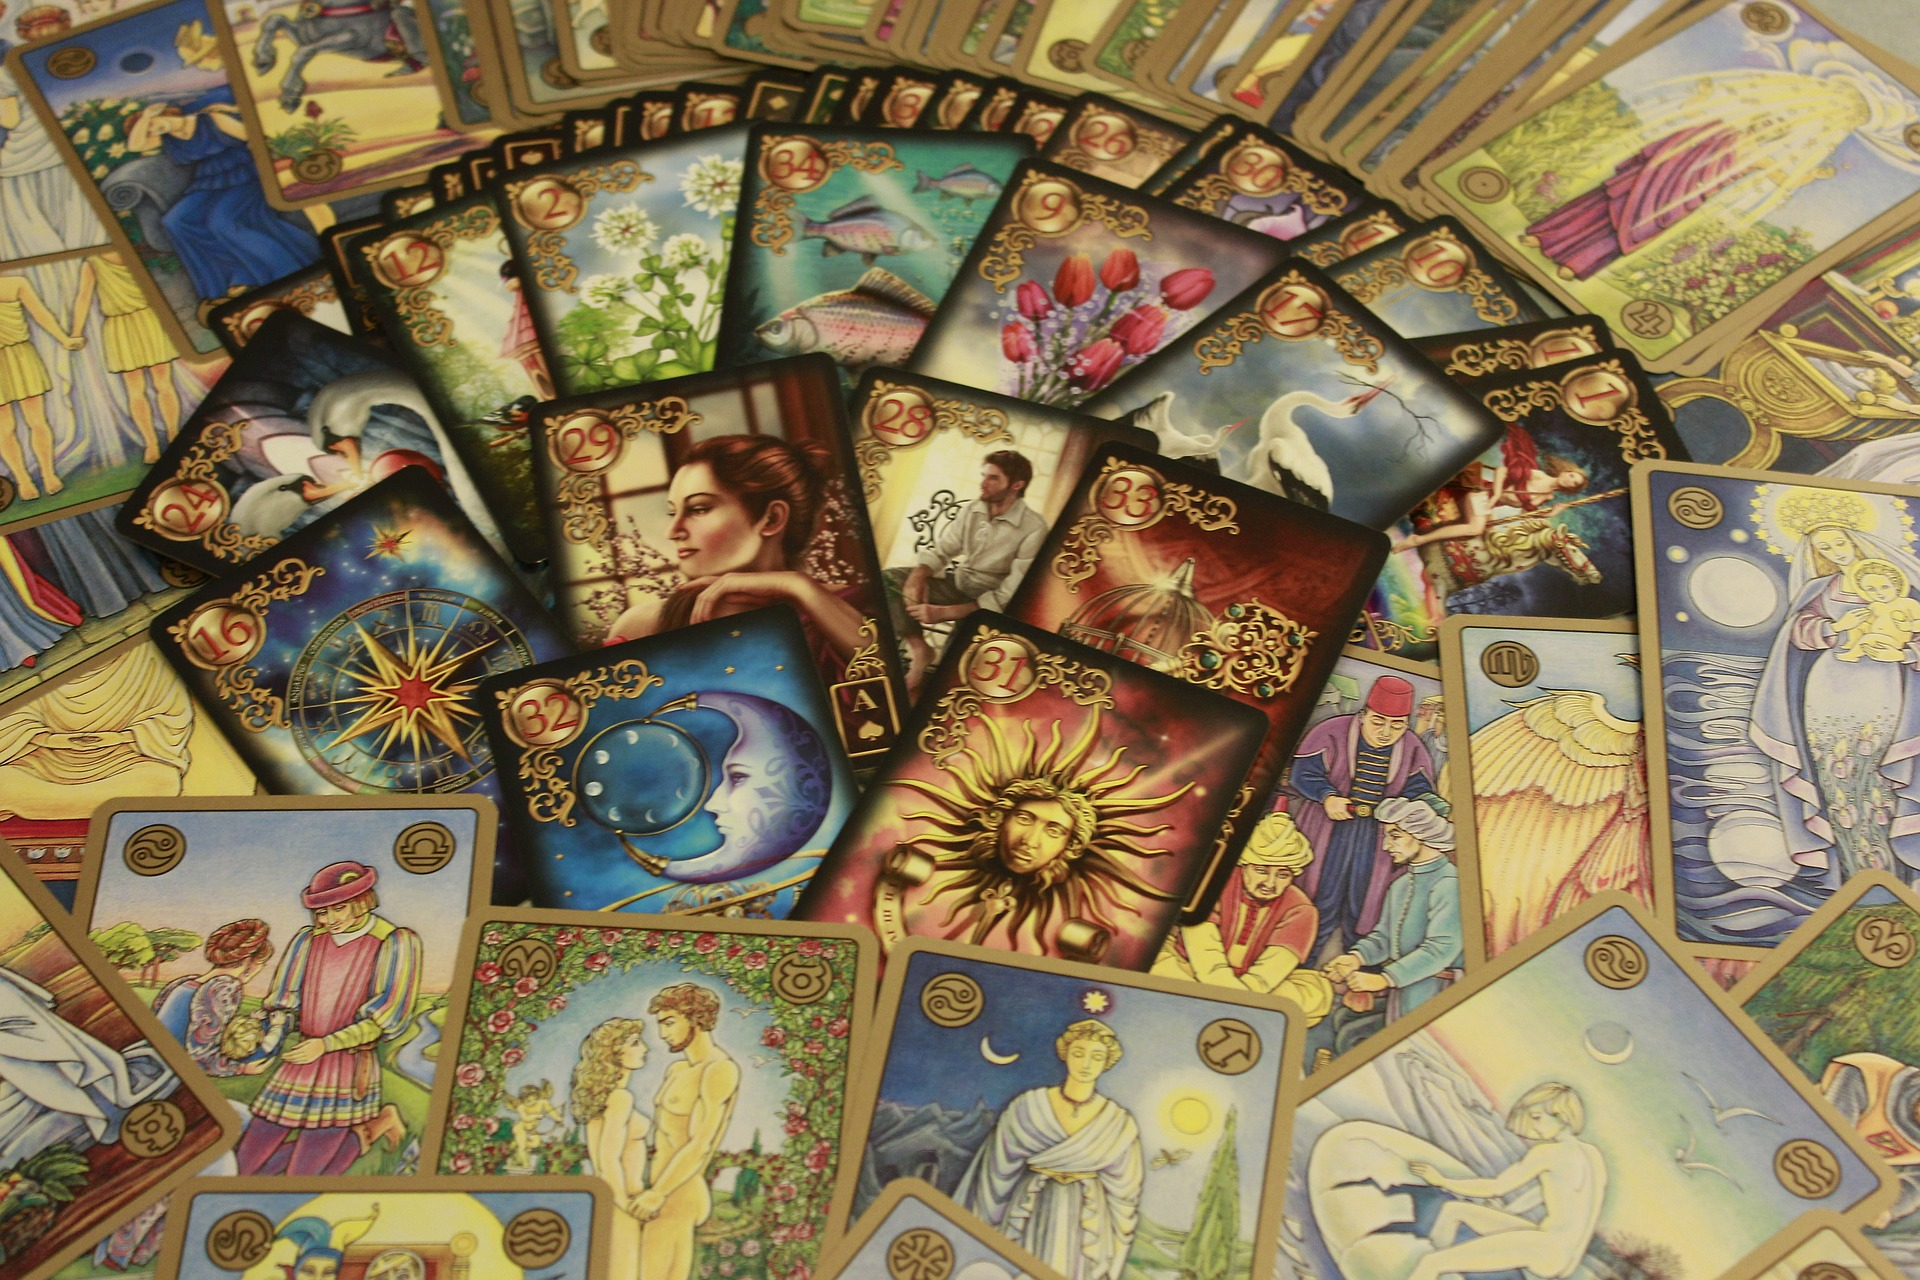 Tarotkarten Kostenlos Online